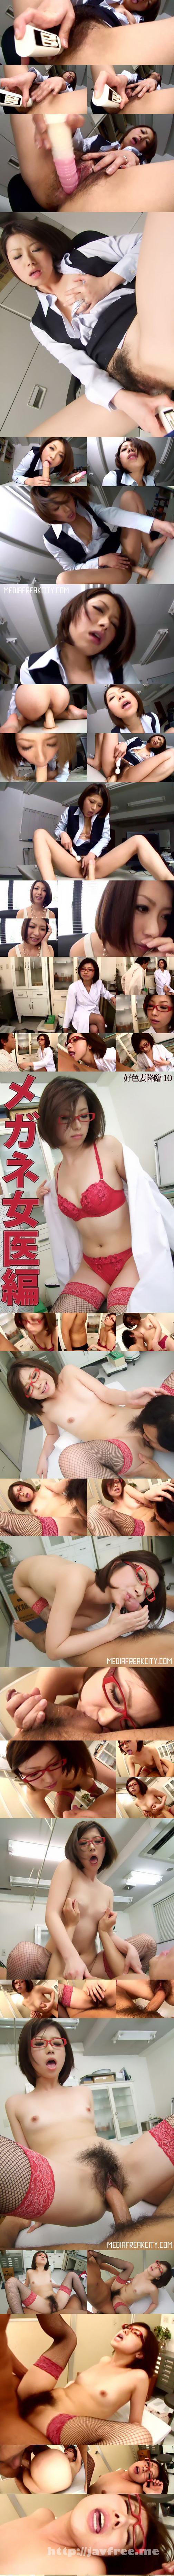 [SKY-169] 好色妻降臨 Vol.10 : 夏樹カオル - image SKY-169_3 on https://javfree.me